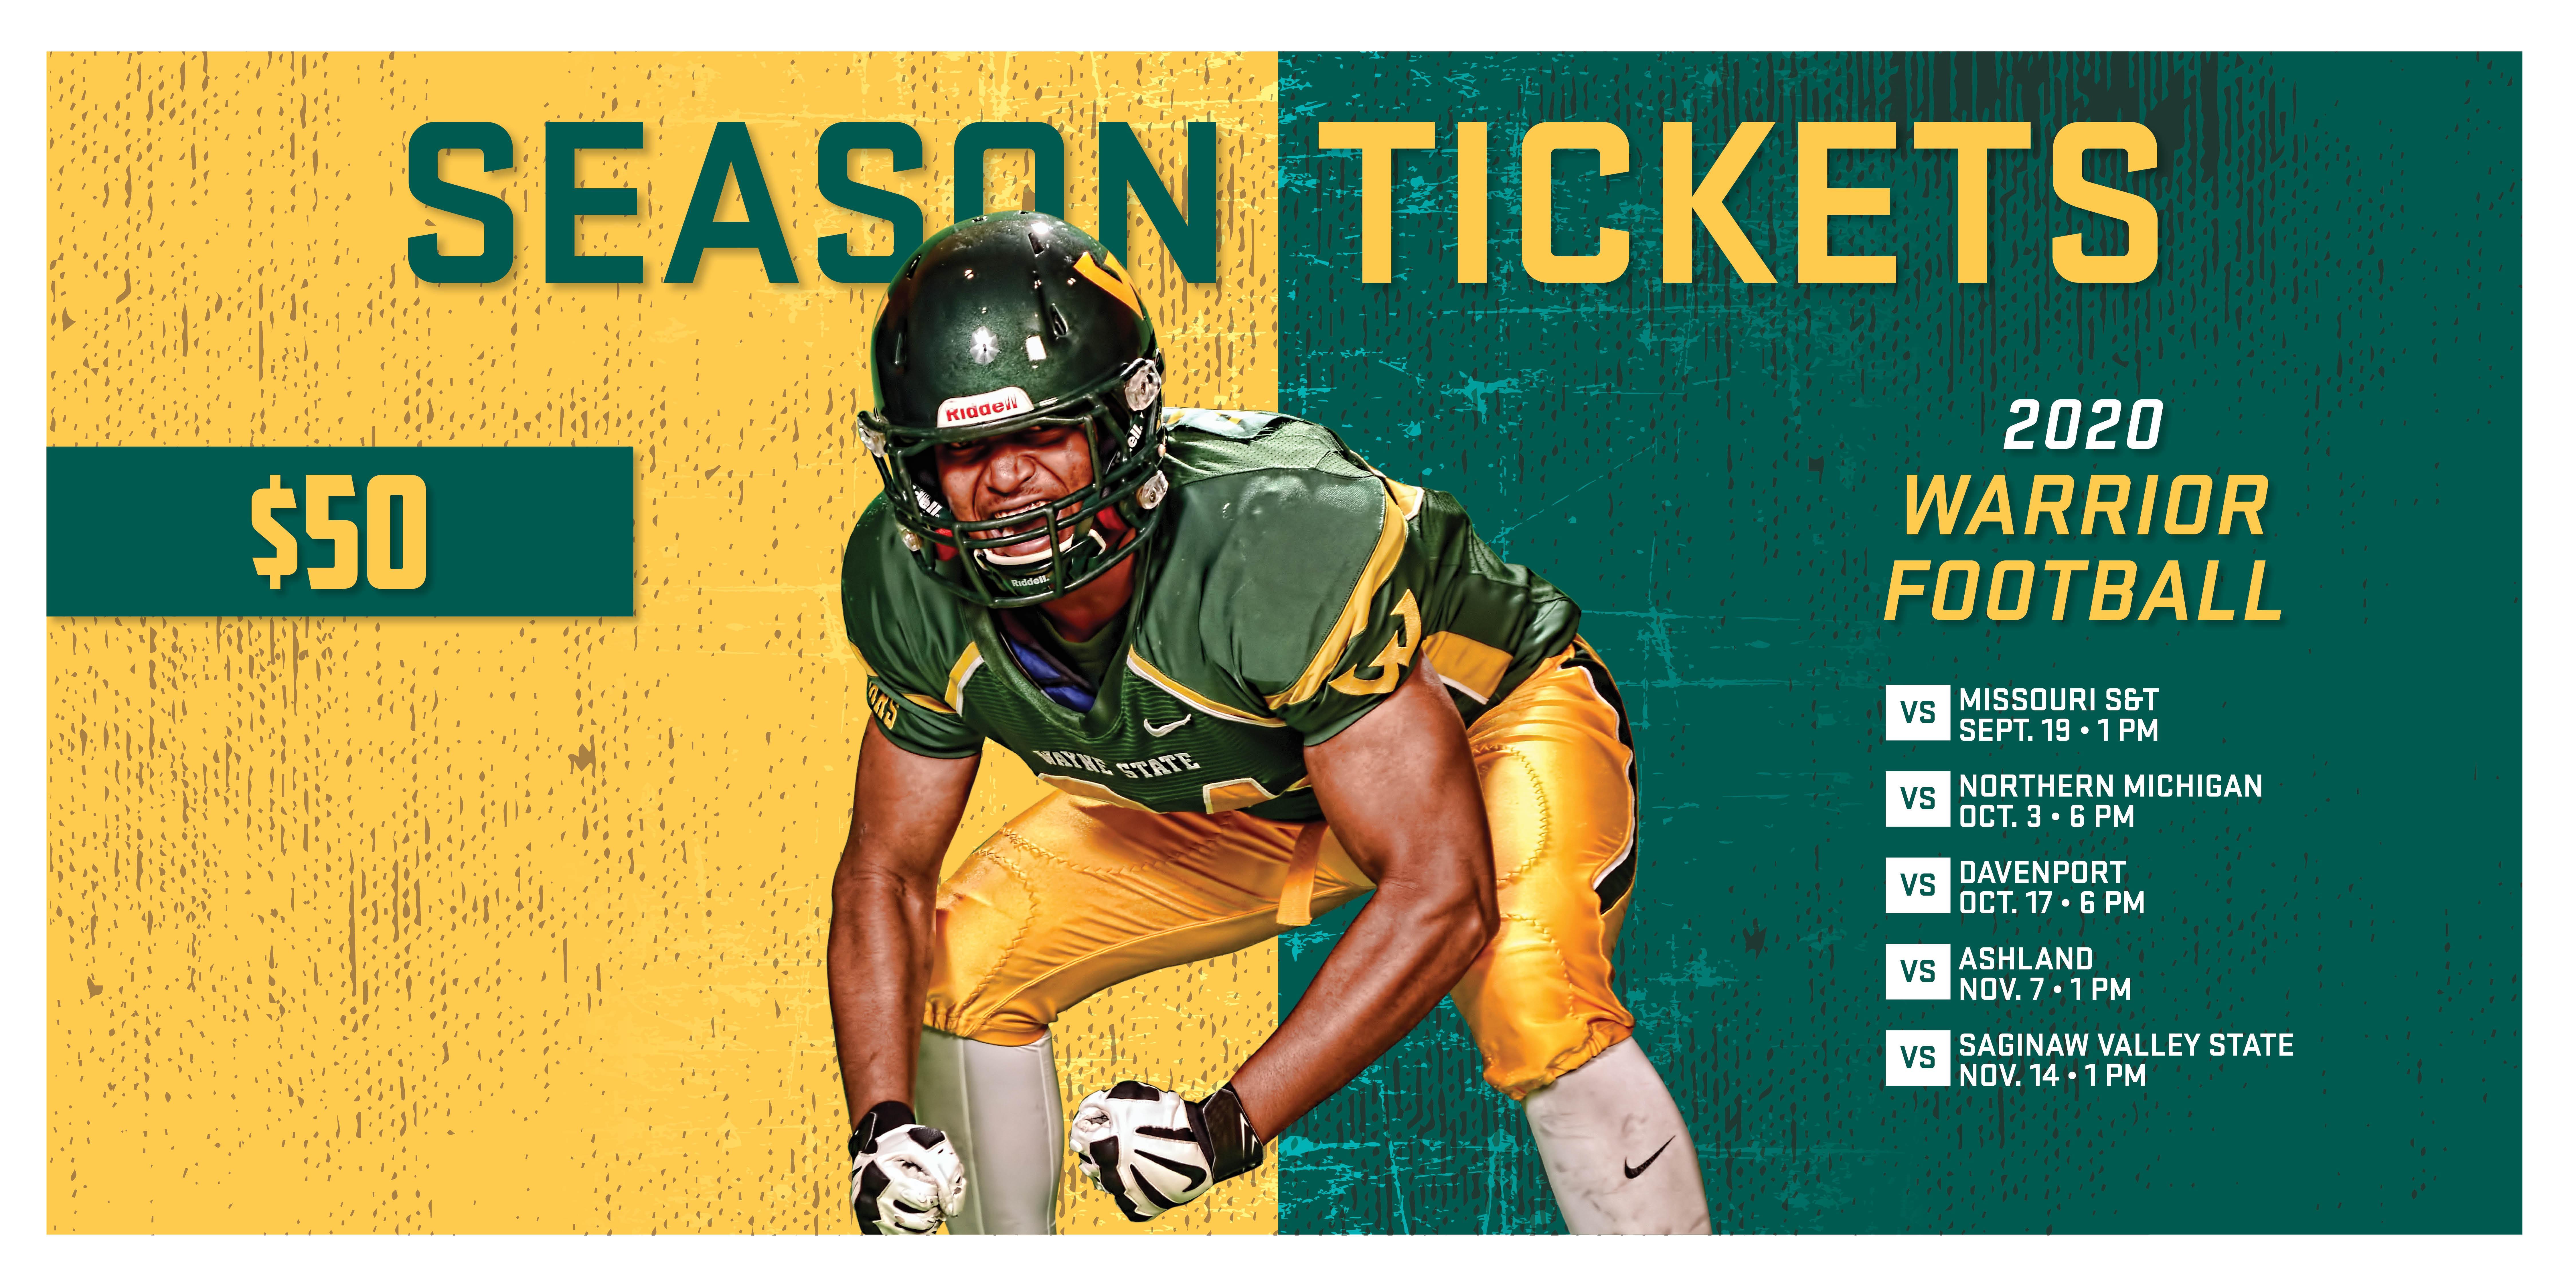 2020 Wayne State University Football Season Tickets